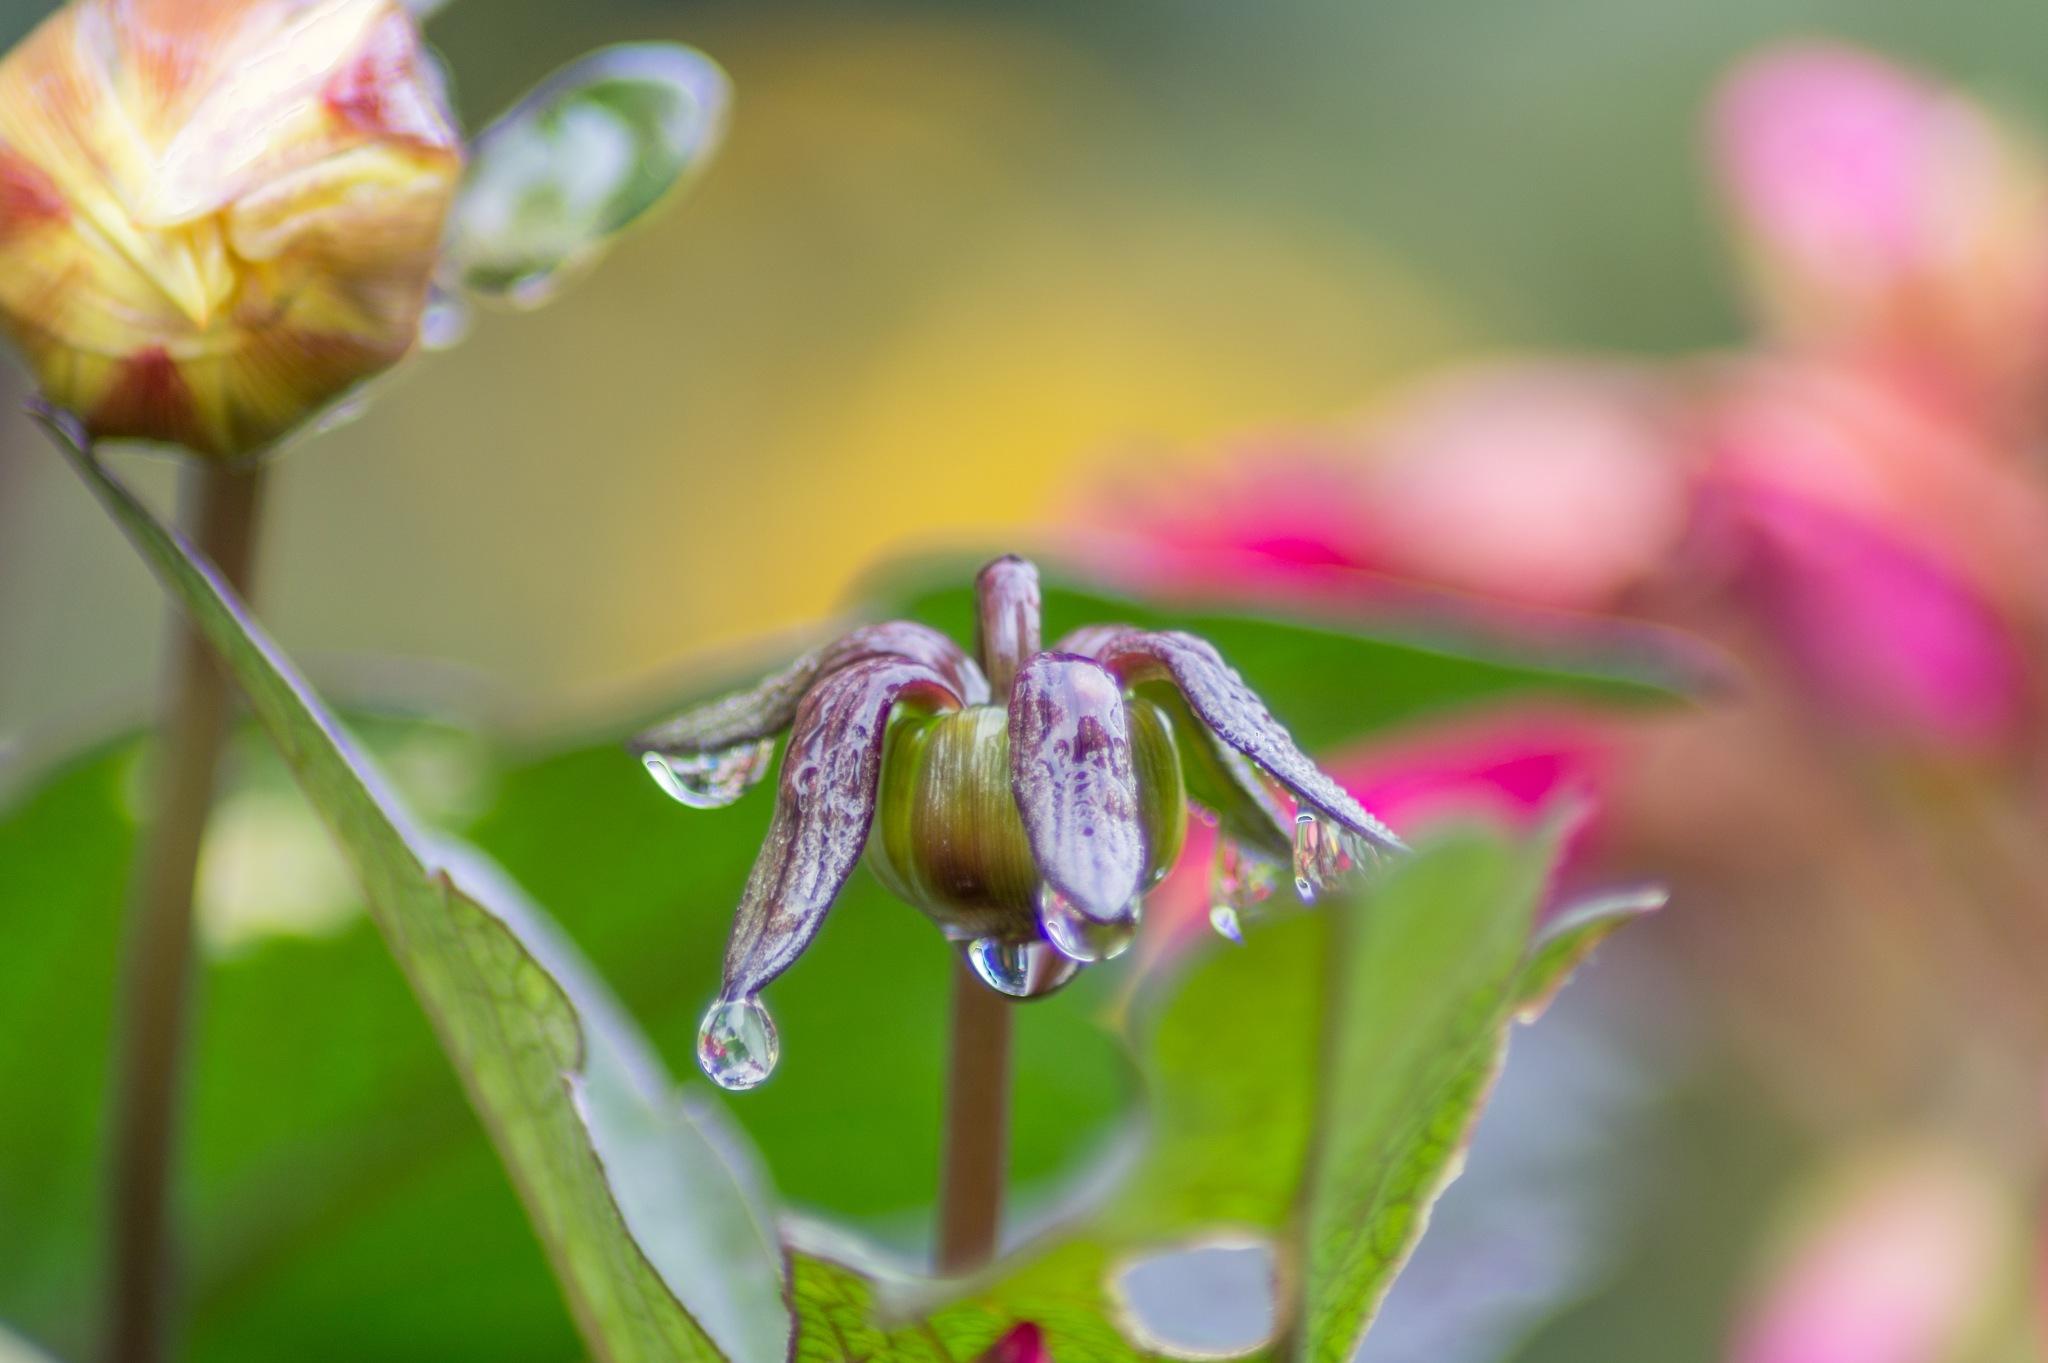 Raindrops from a flower by Marcelo Hernan Zimmt